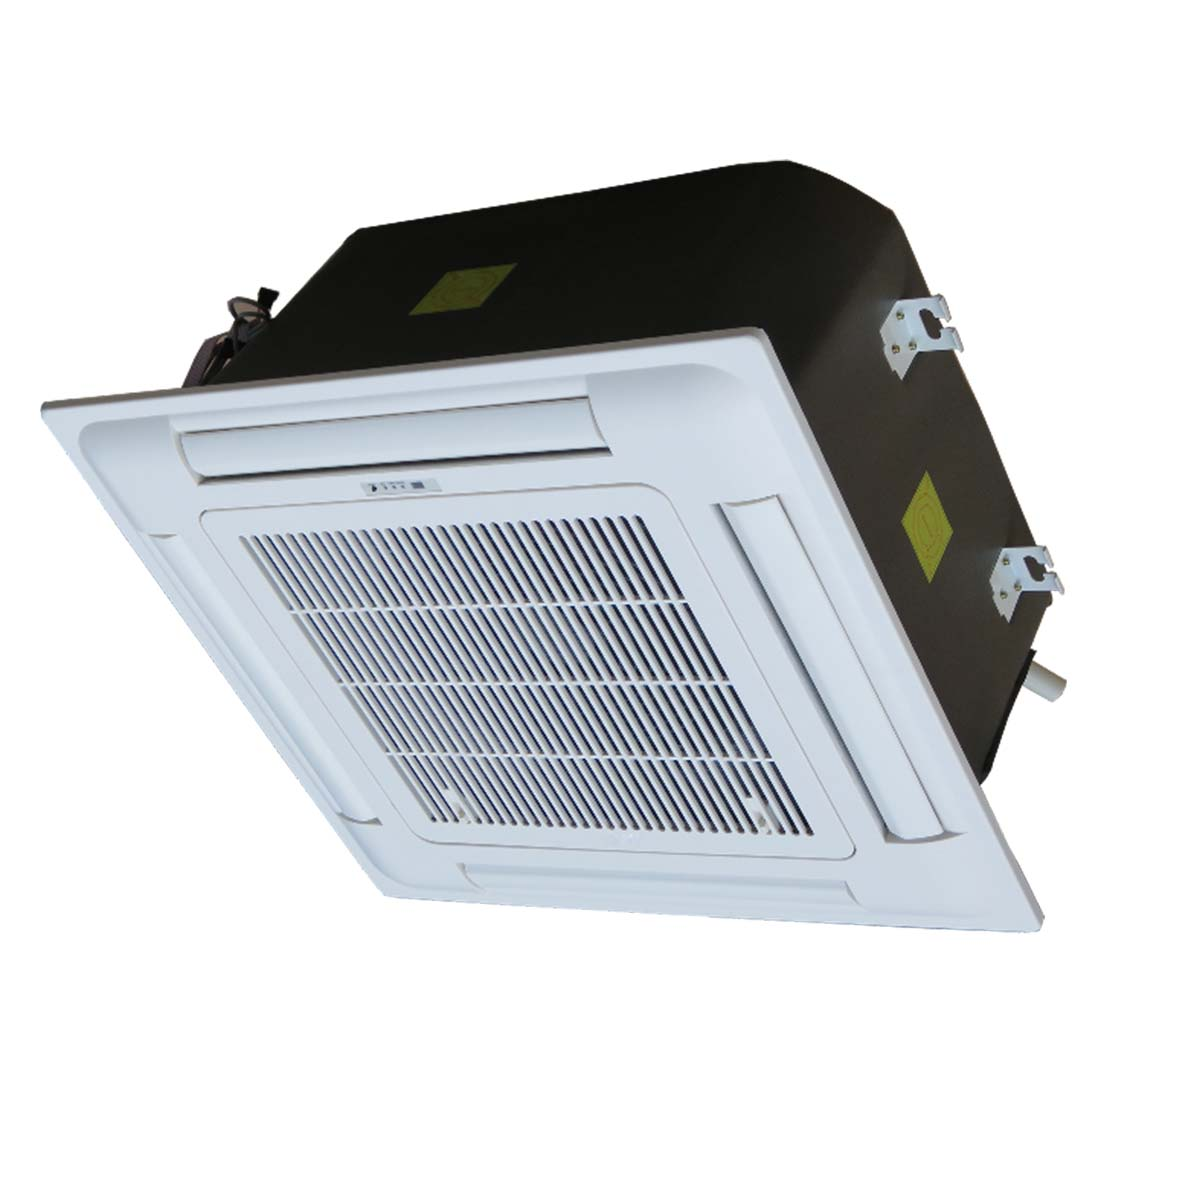 Aparat de aer conditionat tip caseta 4 directii Skyworth U-Match DC Inverter, R32, A++ 10